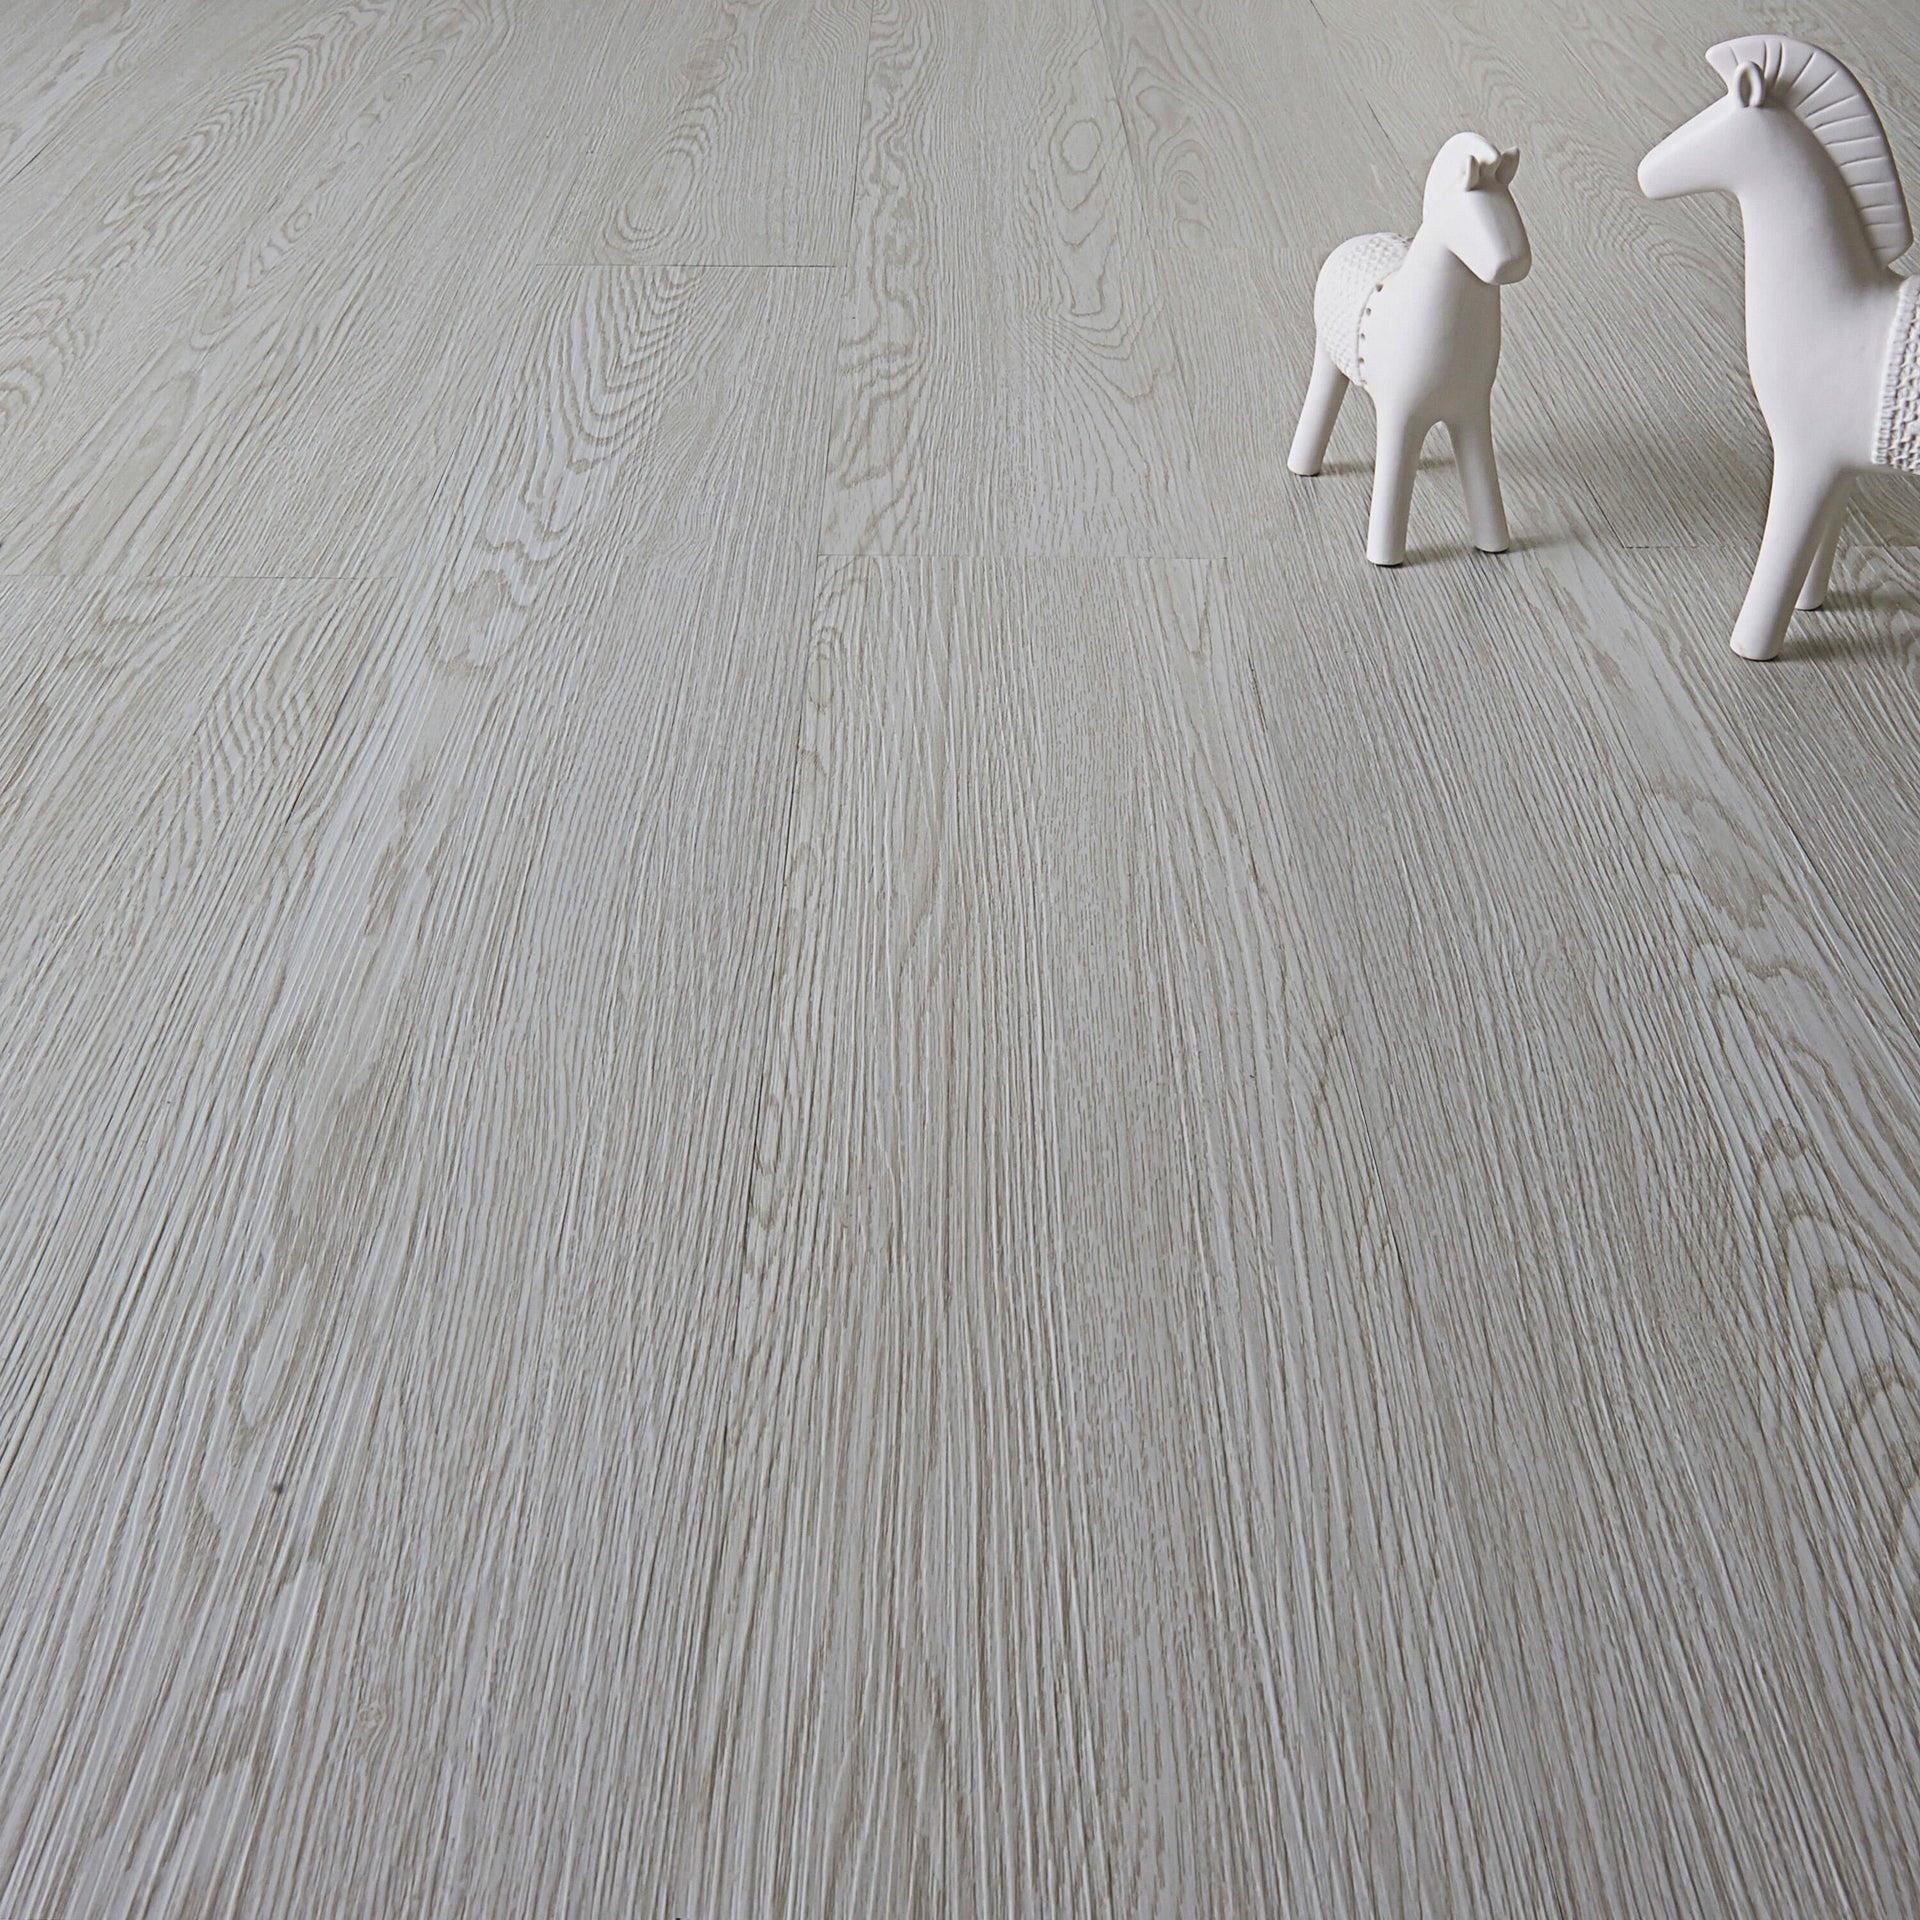 Pavimento PVC adesivo Whiwood Sp 1.8 mm bianco - 5